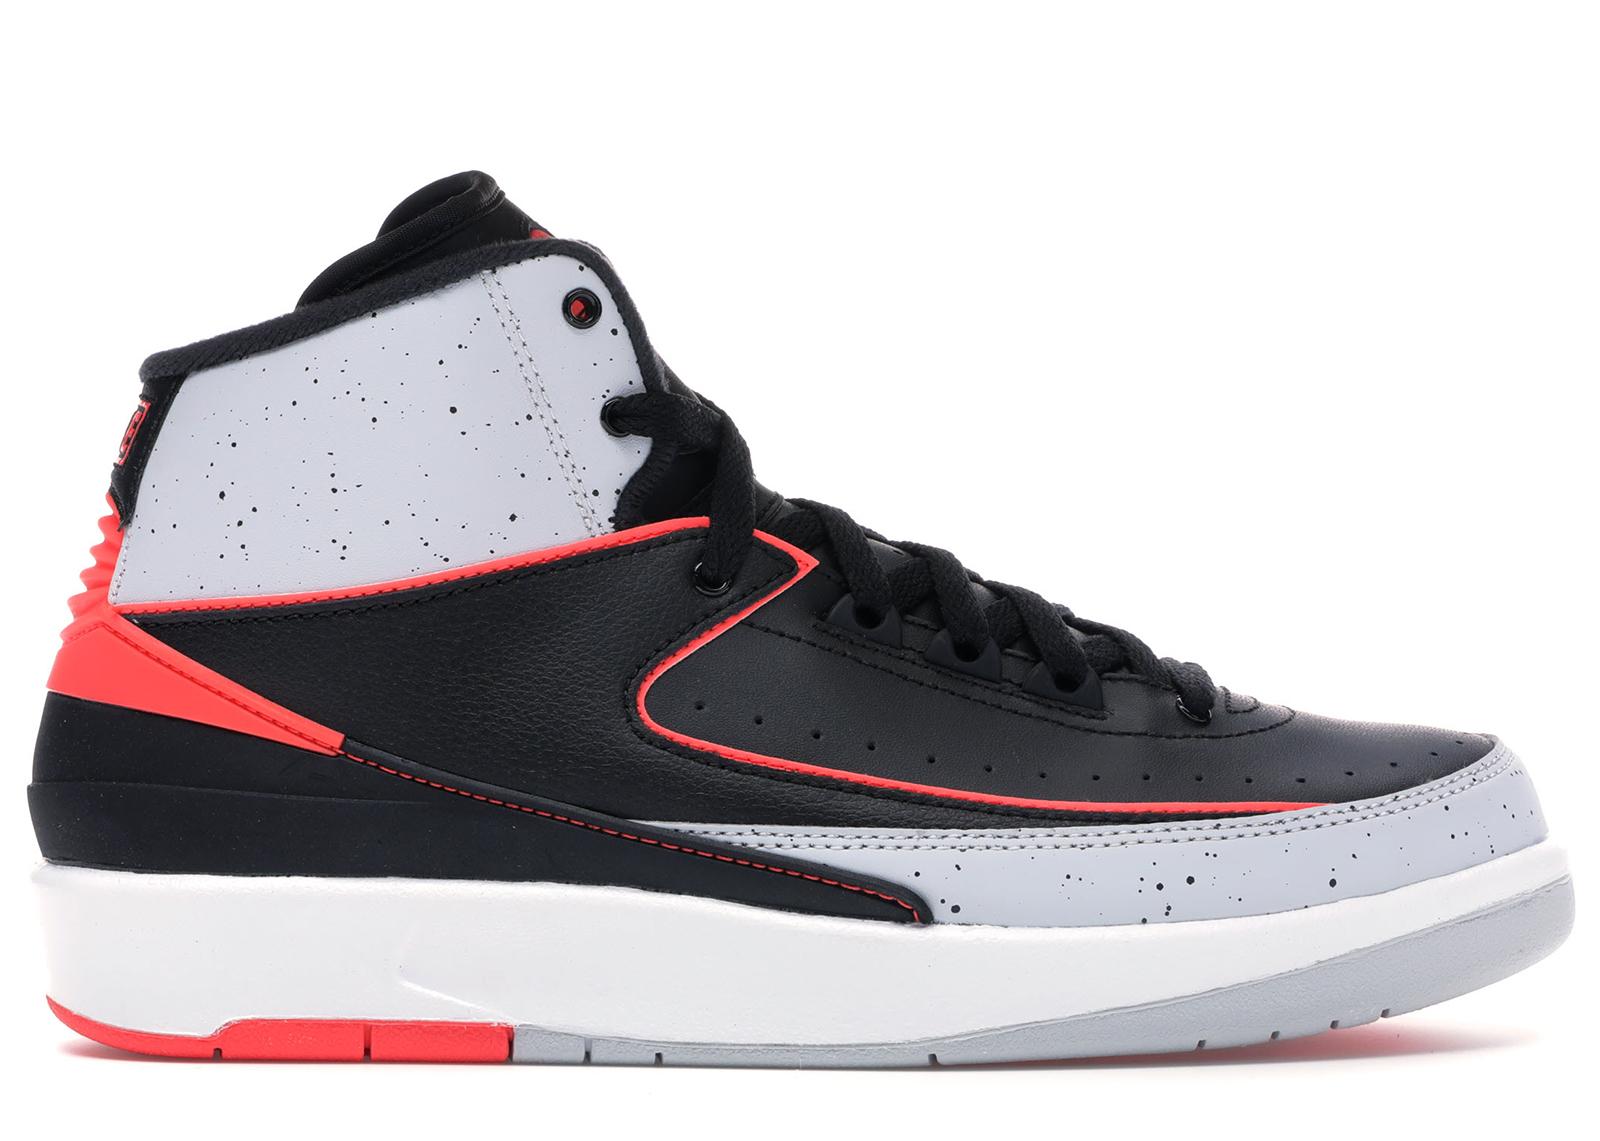 Jordan 2 Retro Infrared 23 (GS